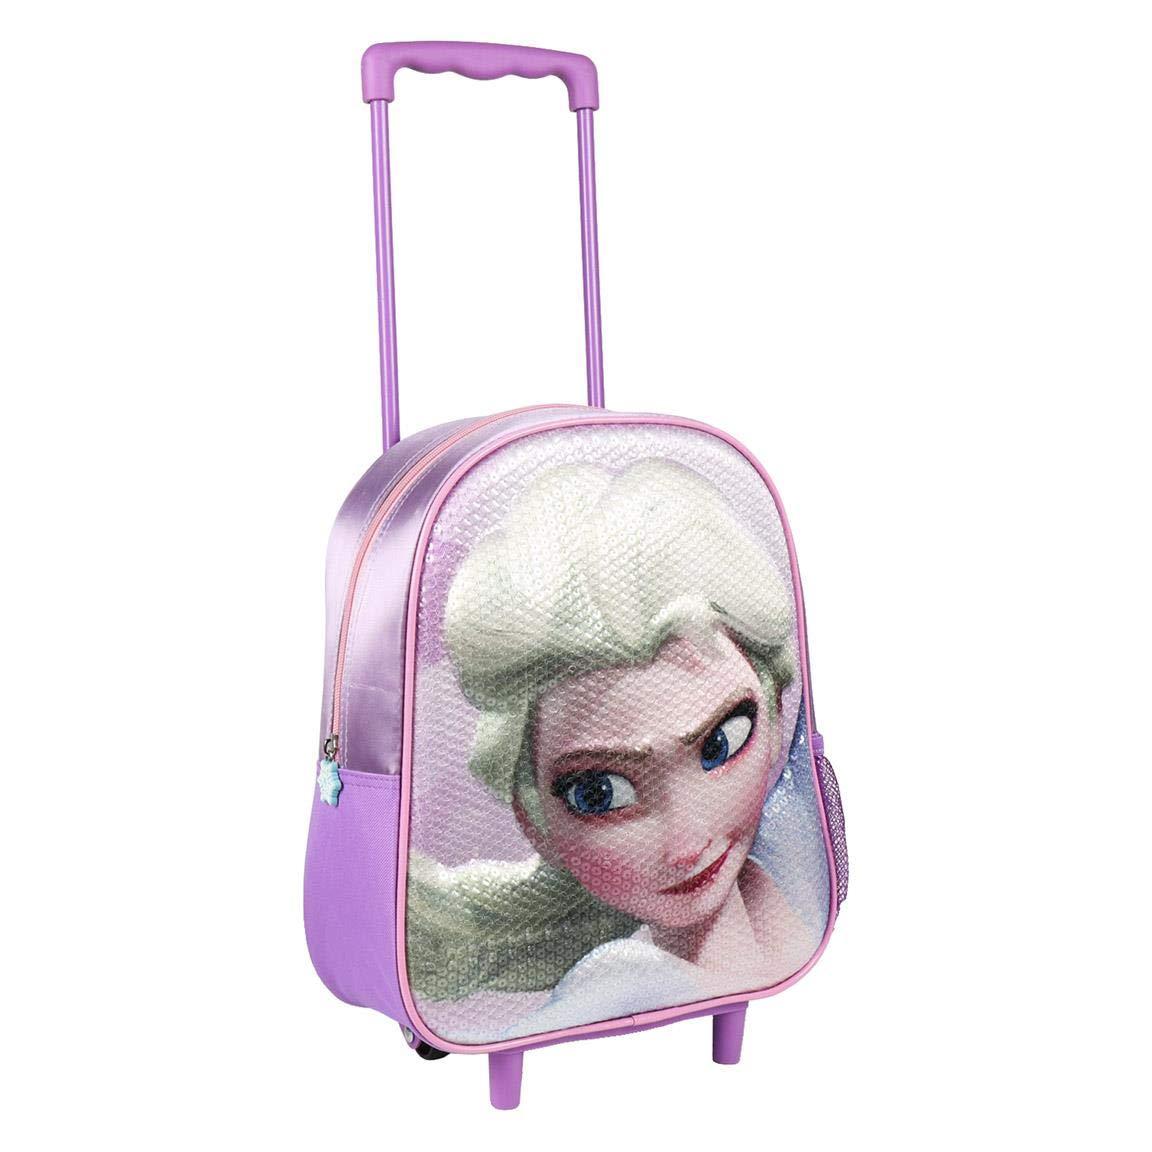 Artesania Cerda Mochila Carro Infantil 3D Frozen Children's Backpack, 31 cm, Purple (Morado)